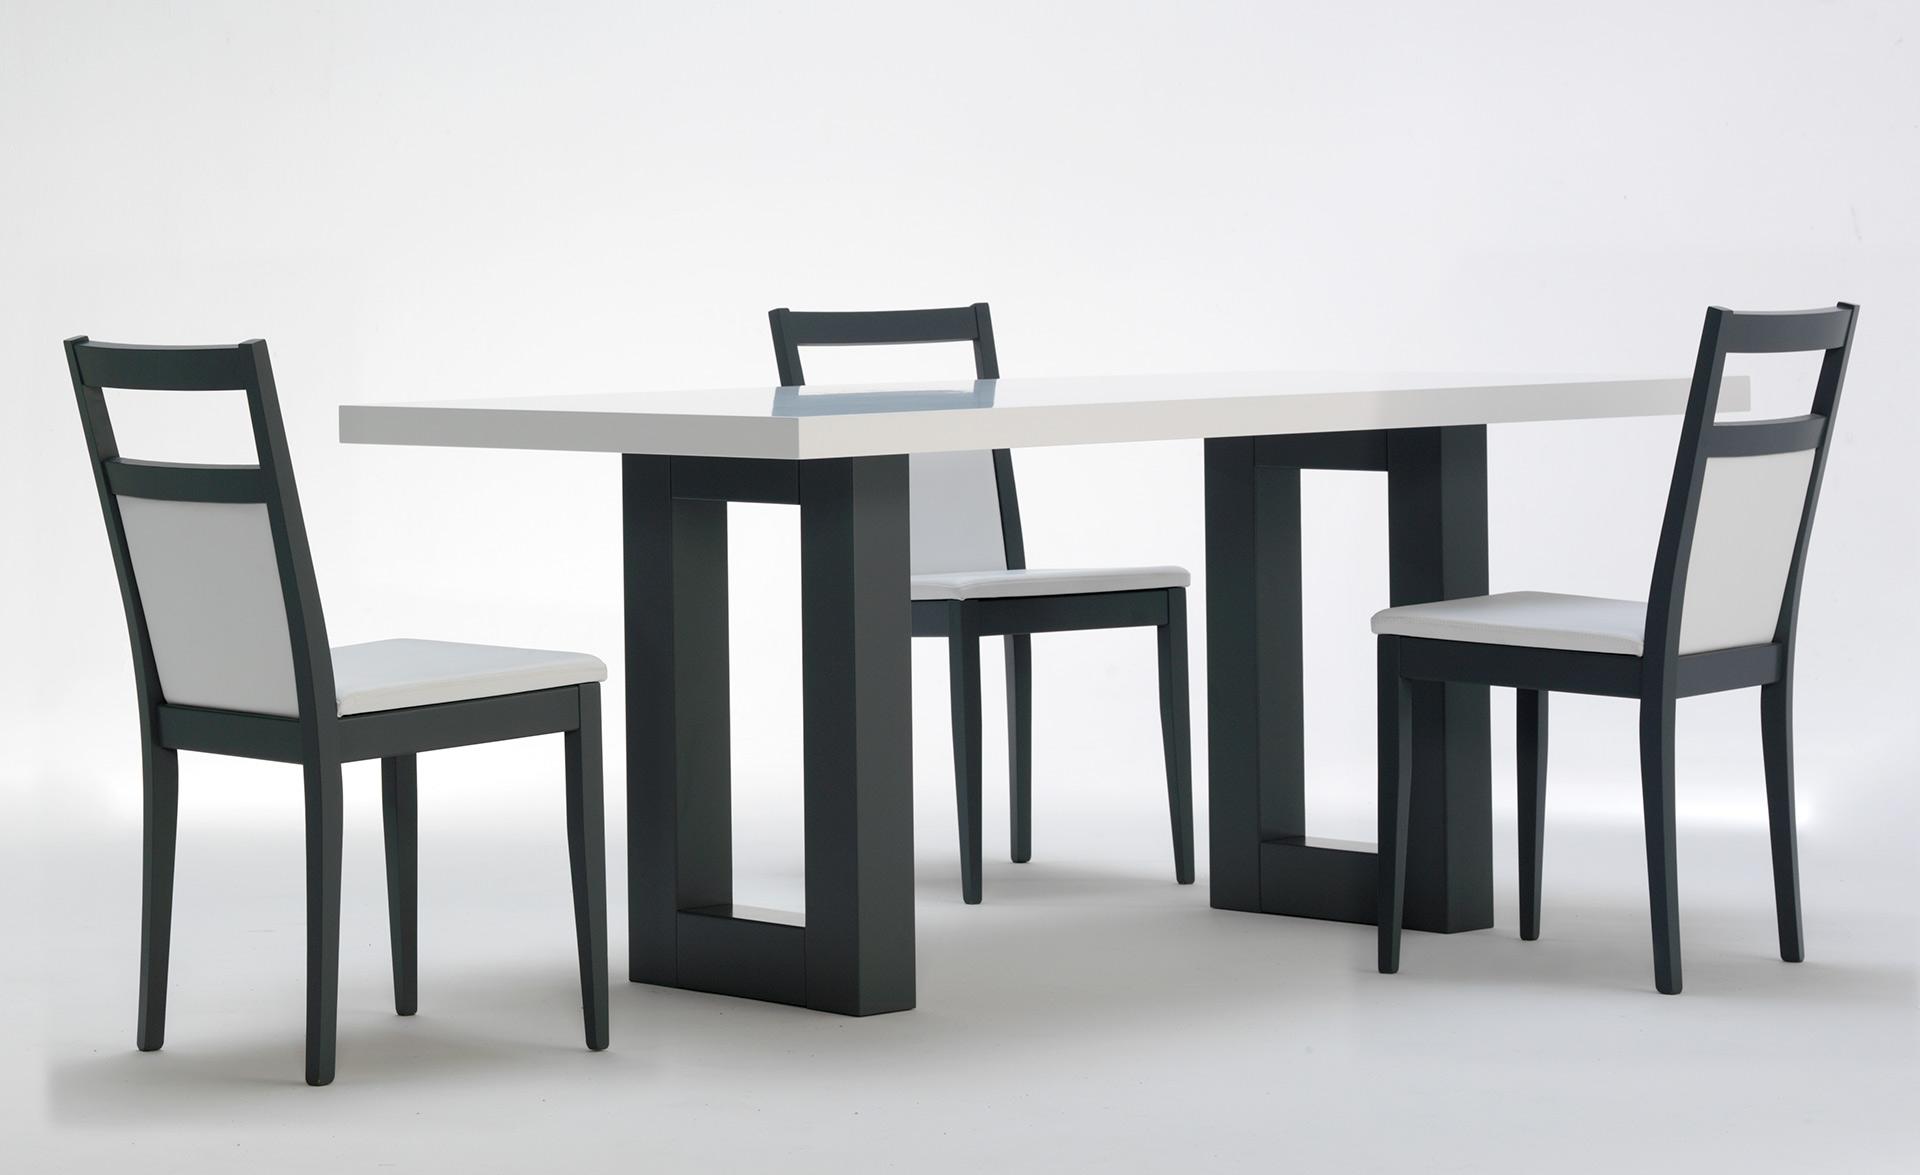 Tavolo roger bianco base grigia con sedie candy grigie ed ecopelle bianca italians do it - Tavolo con sedie offerte ...